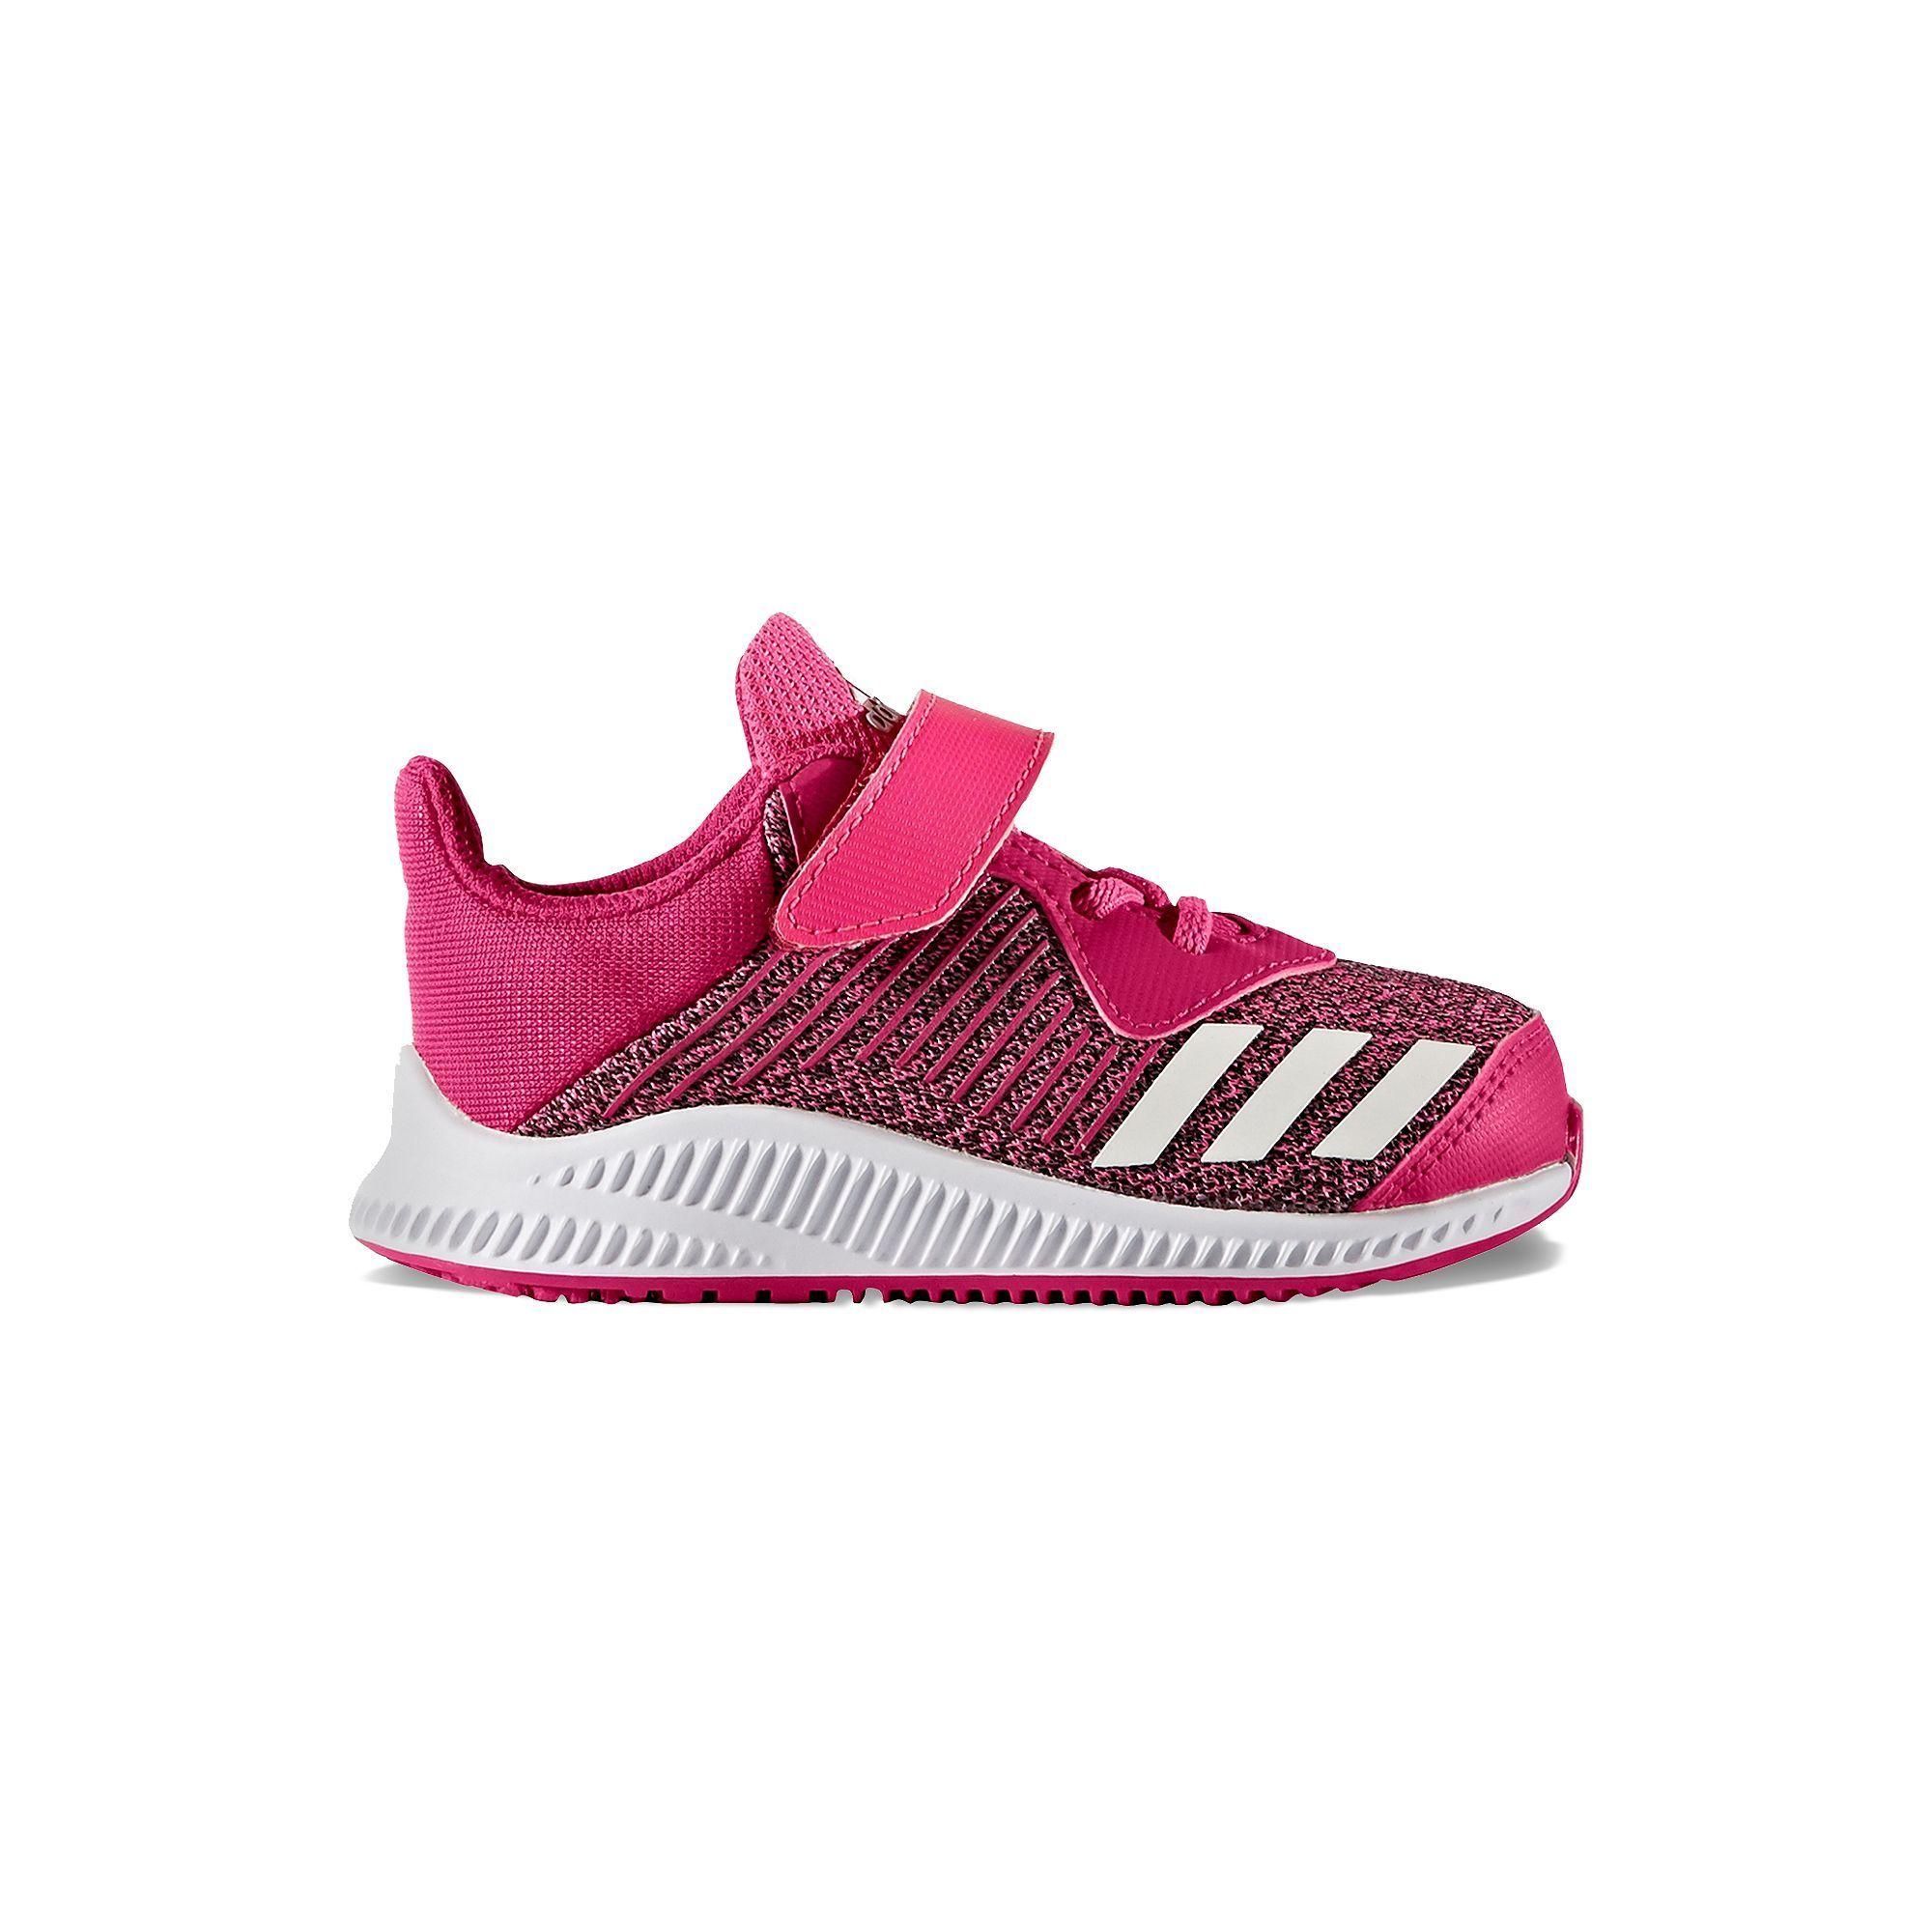 Adidas Forta Run EL Toddler Girls' Running Shoes, Size: 10 T, Brt Pink